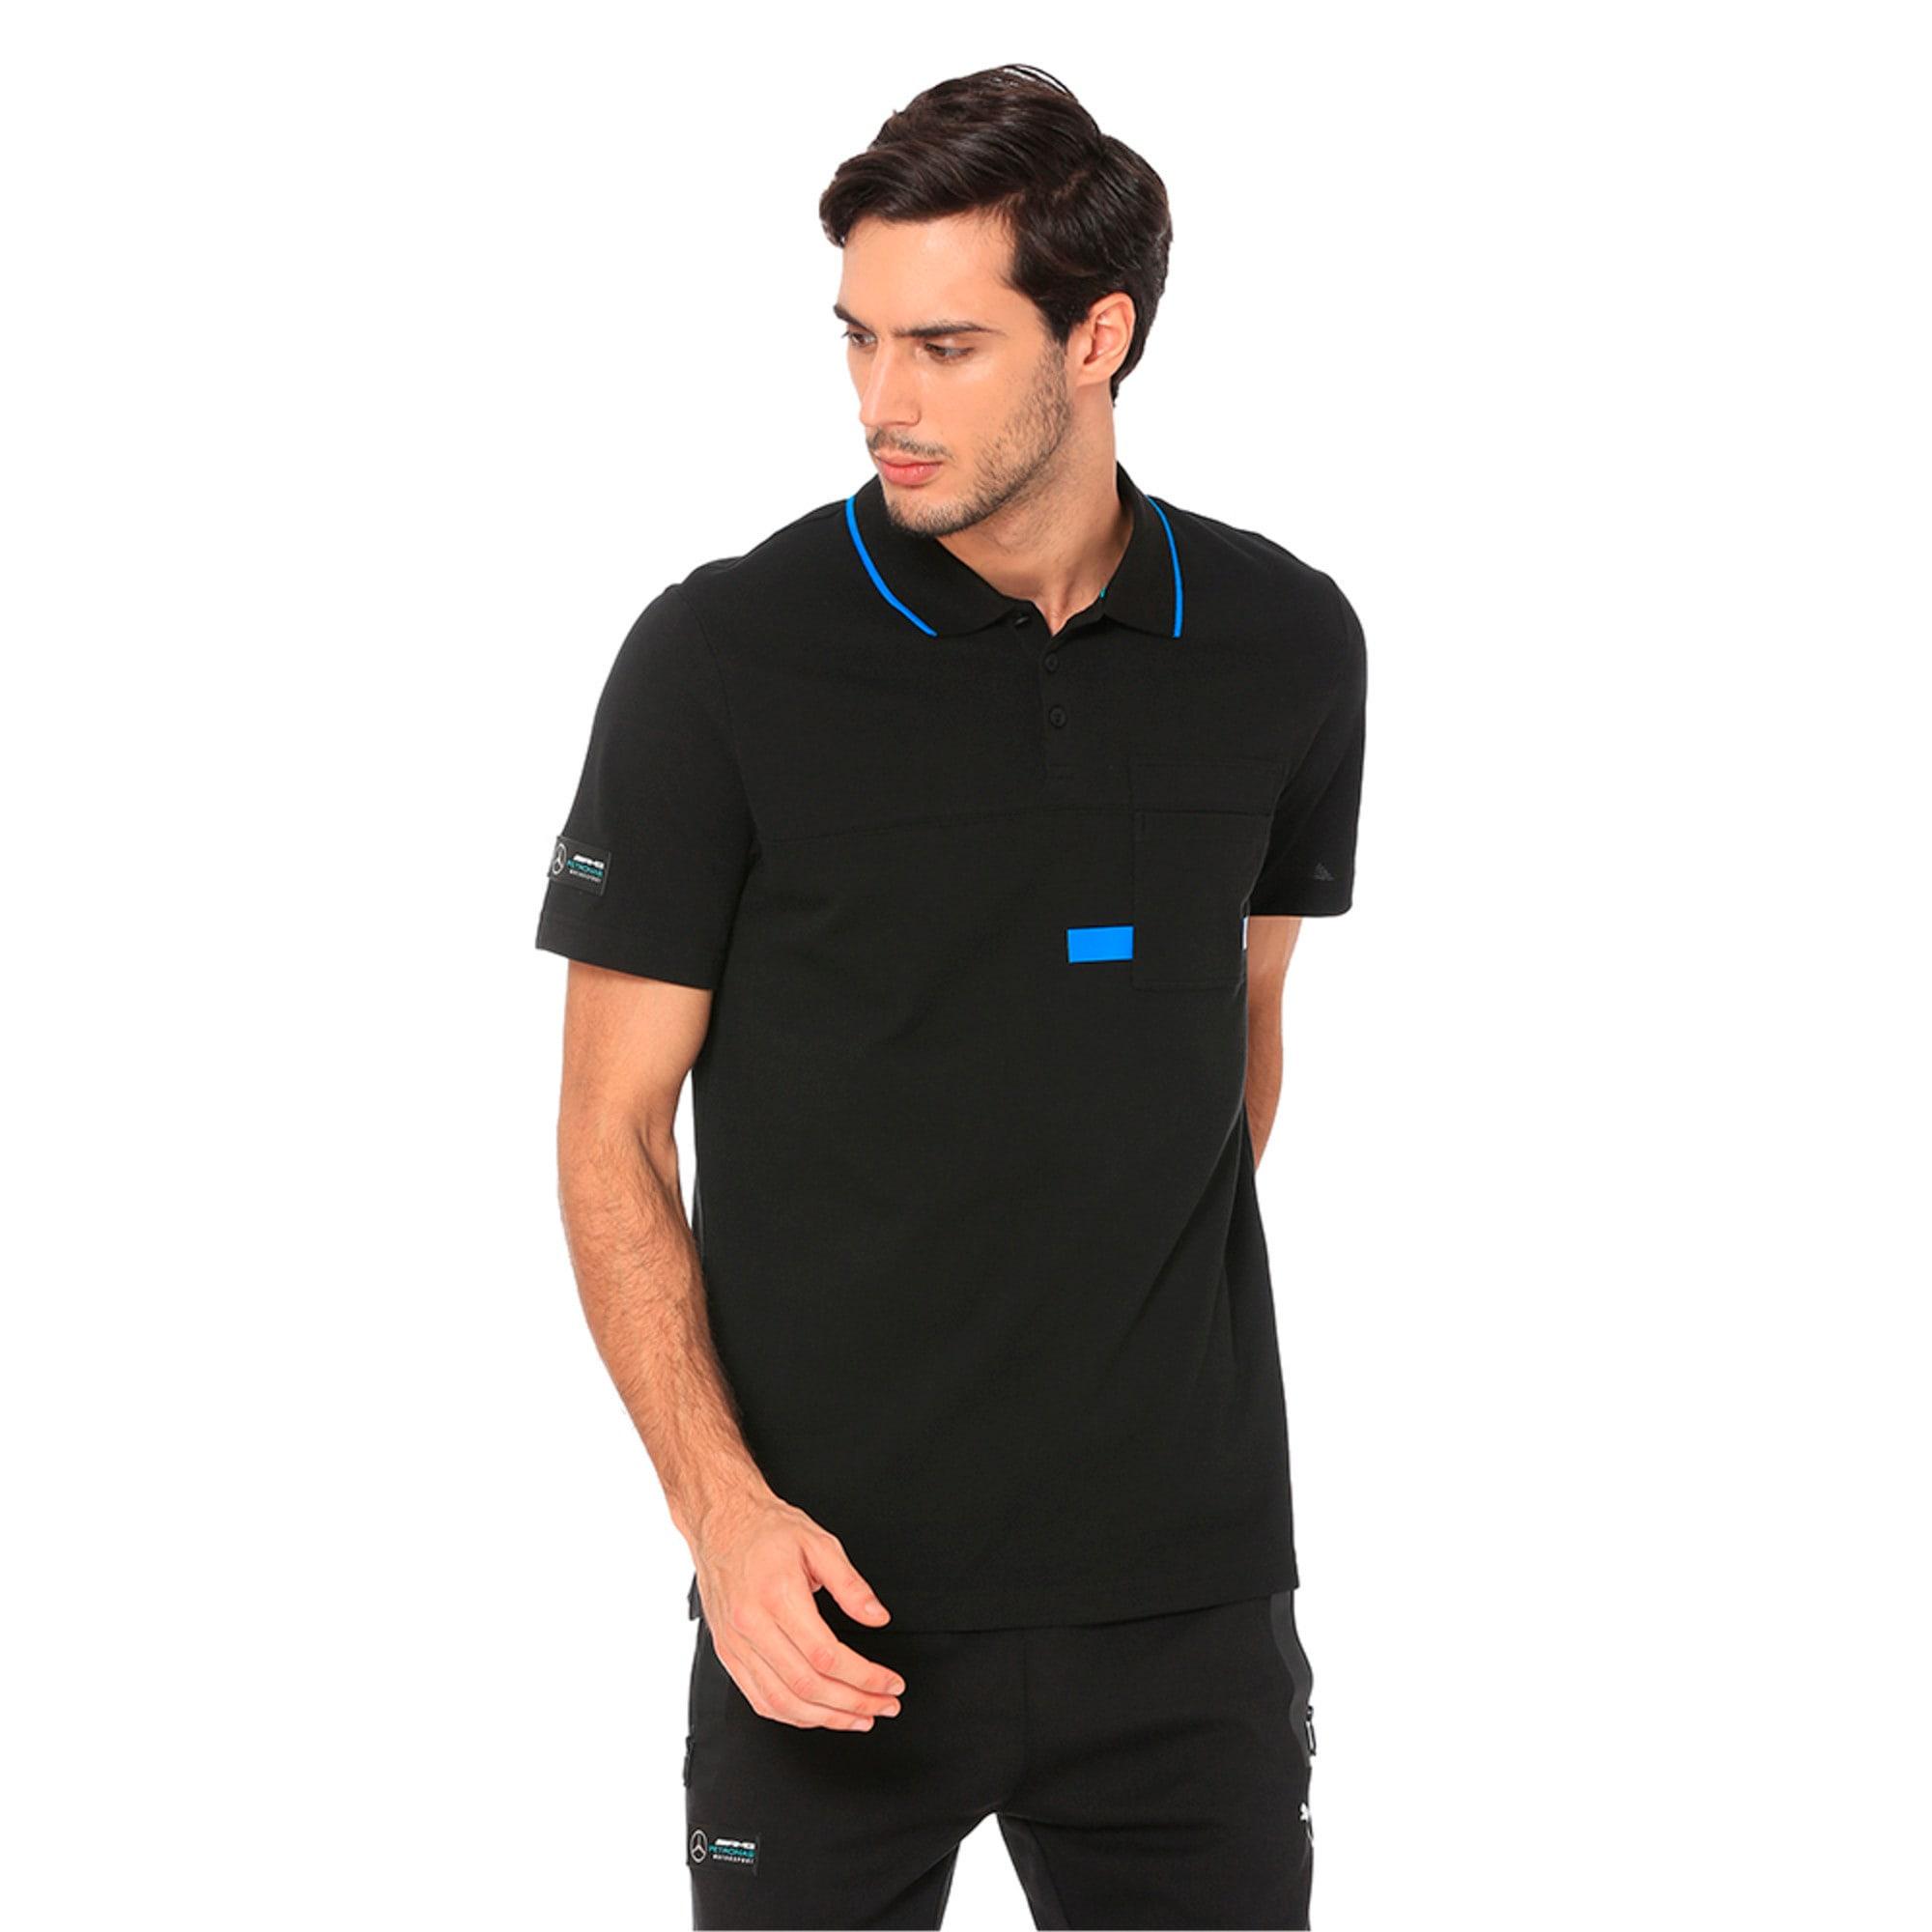 Thumbnail 1 of MERCEDES AMG PETRONAS Men's Polo Shirt, Puma Black, medium-IND